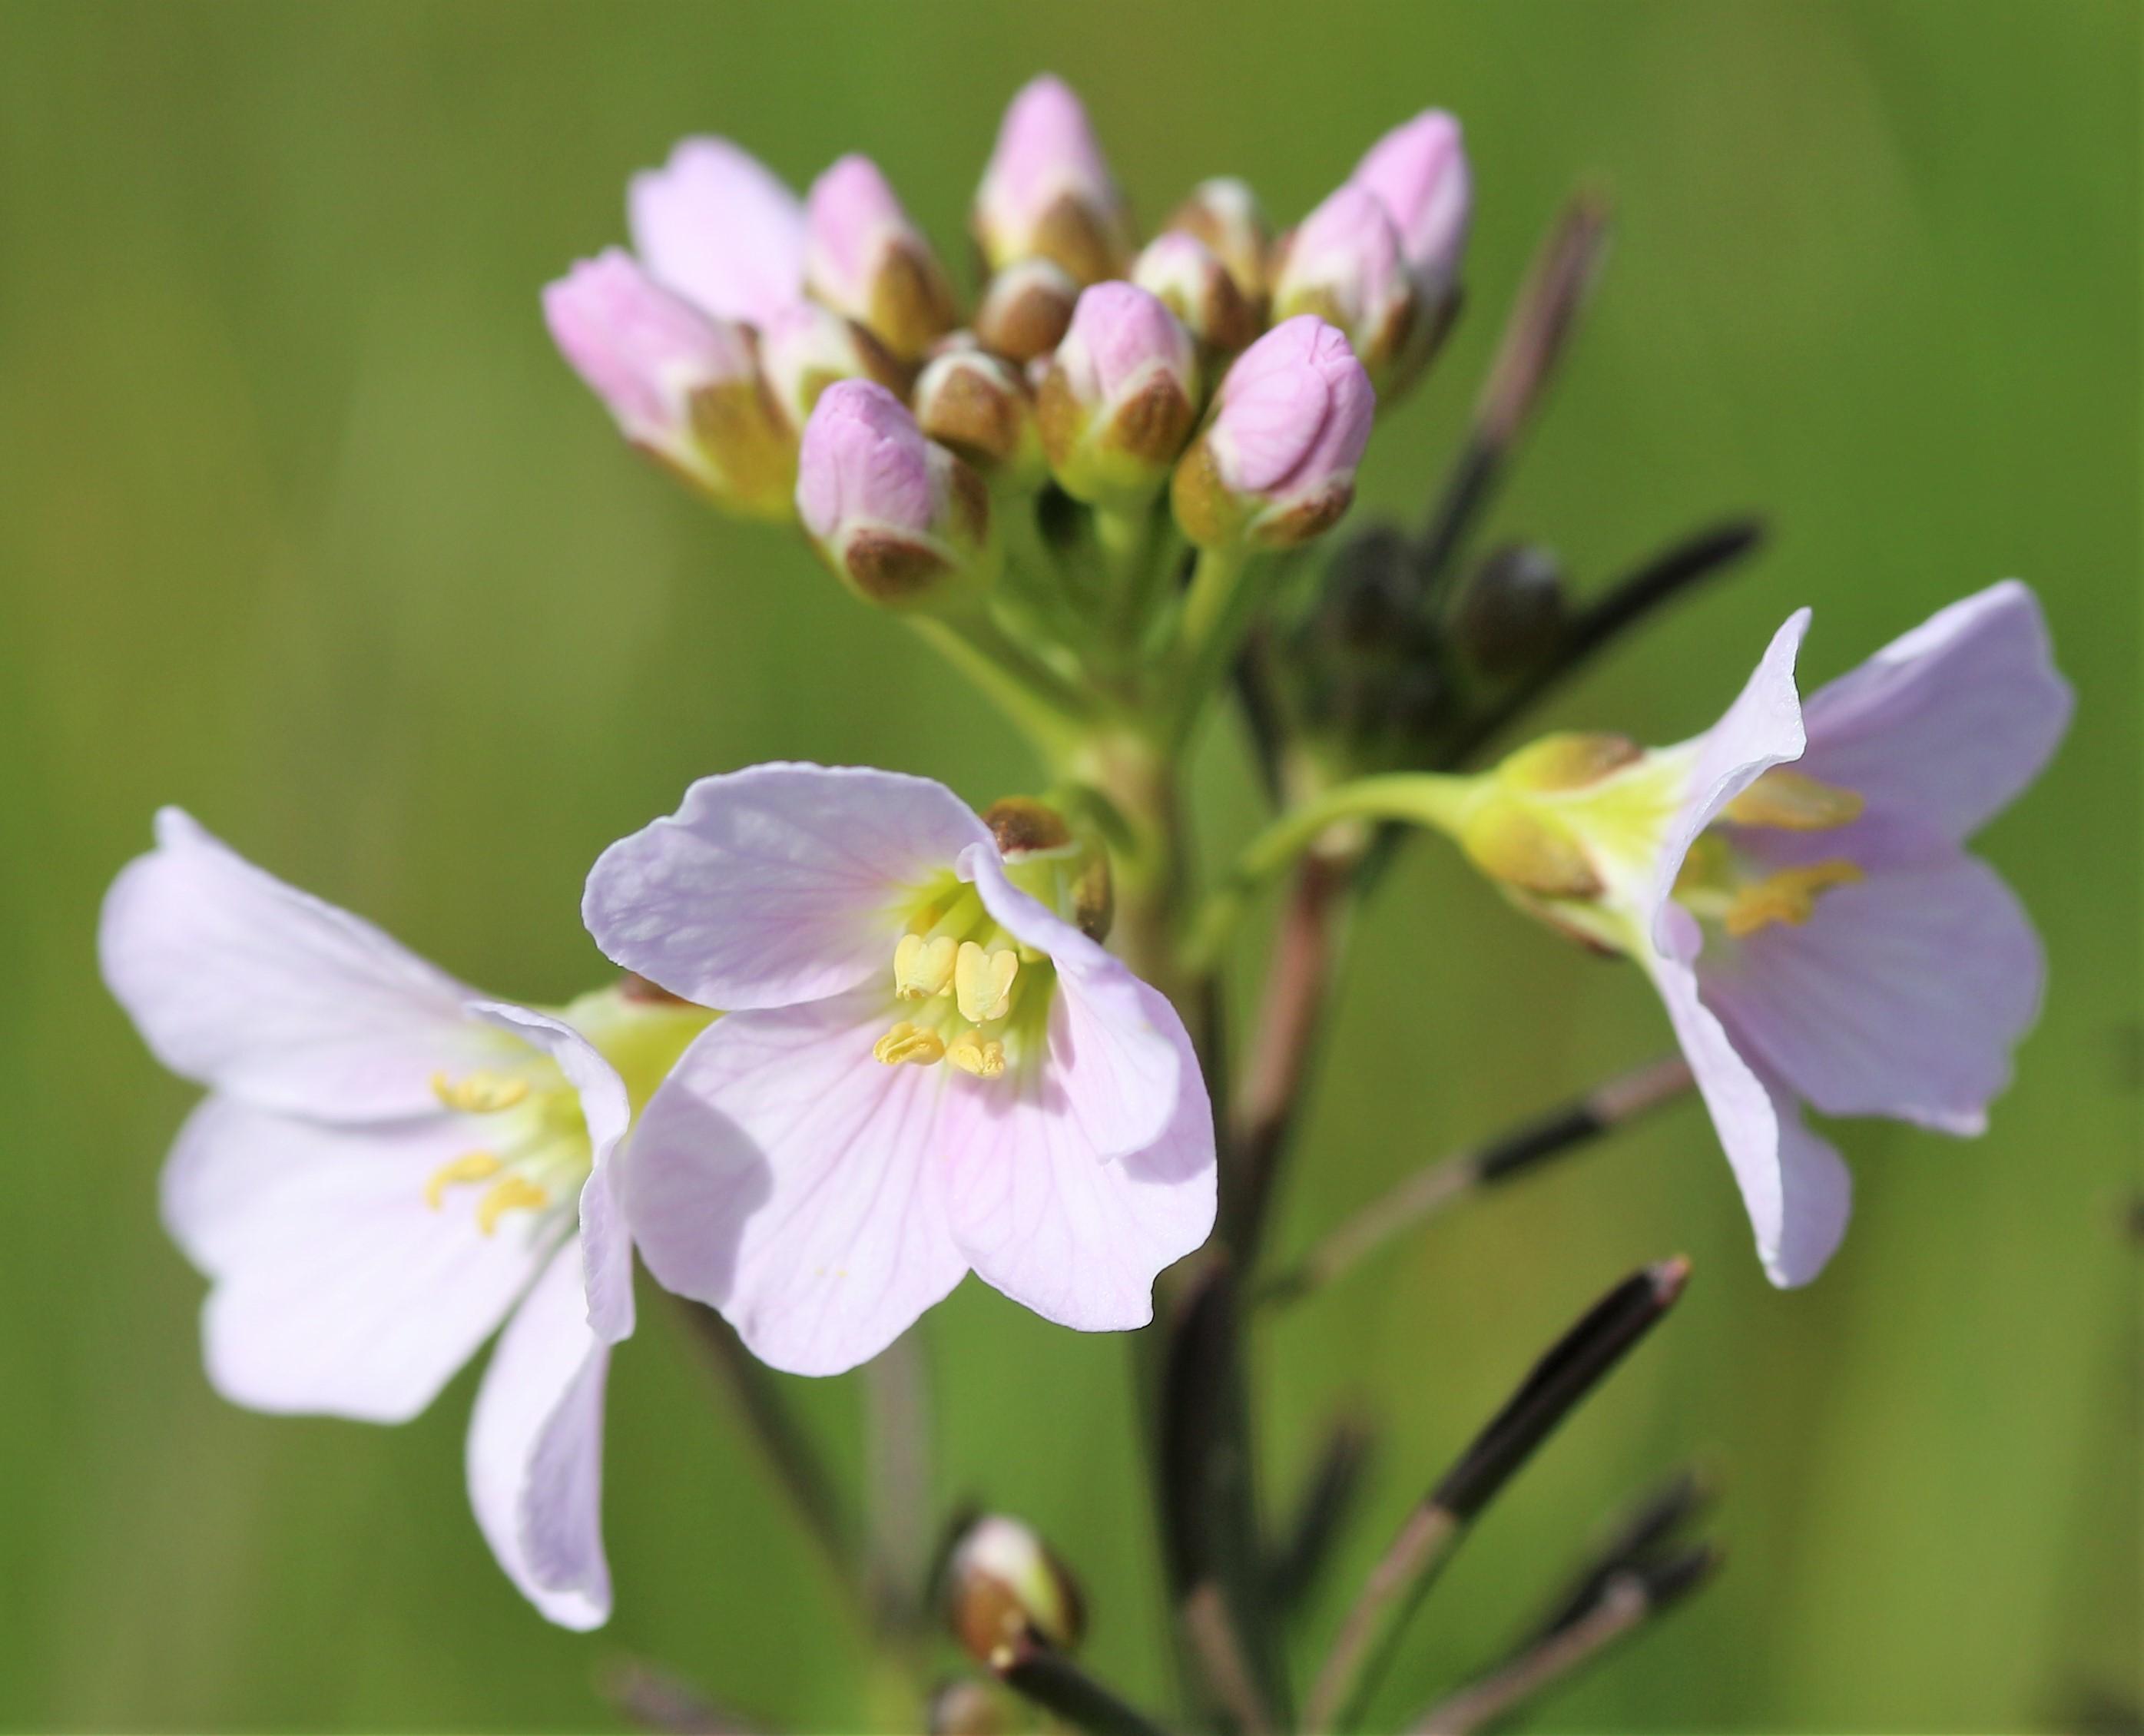 Cardamine pratensis. Cuckoo flower.